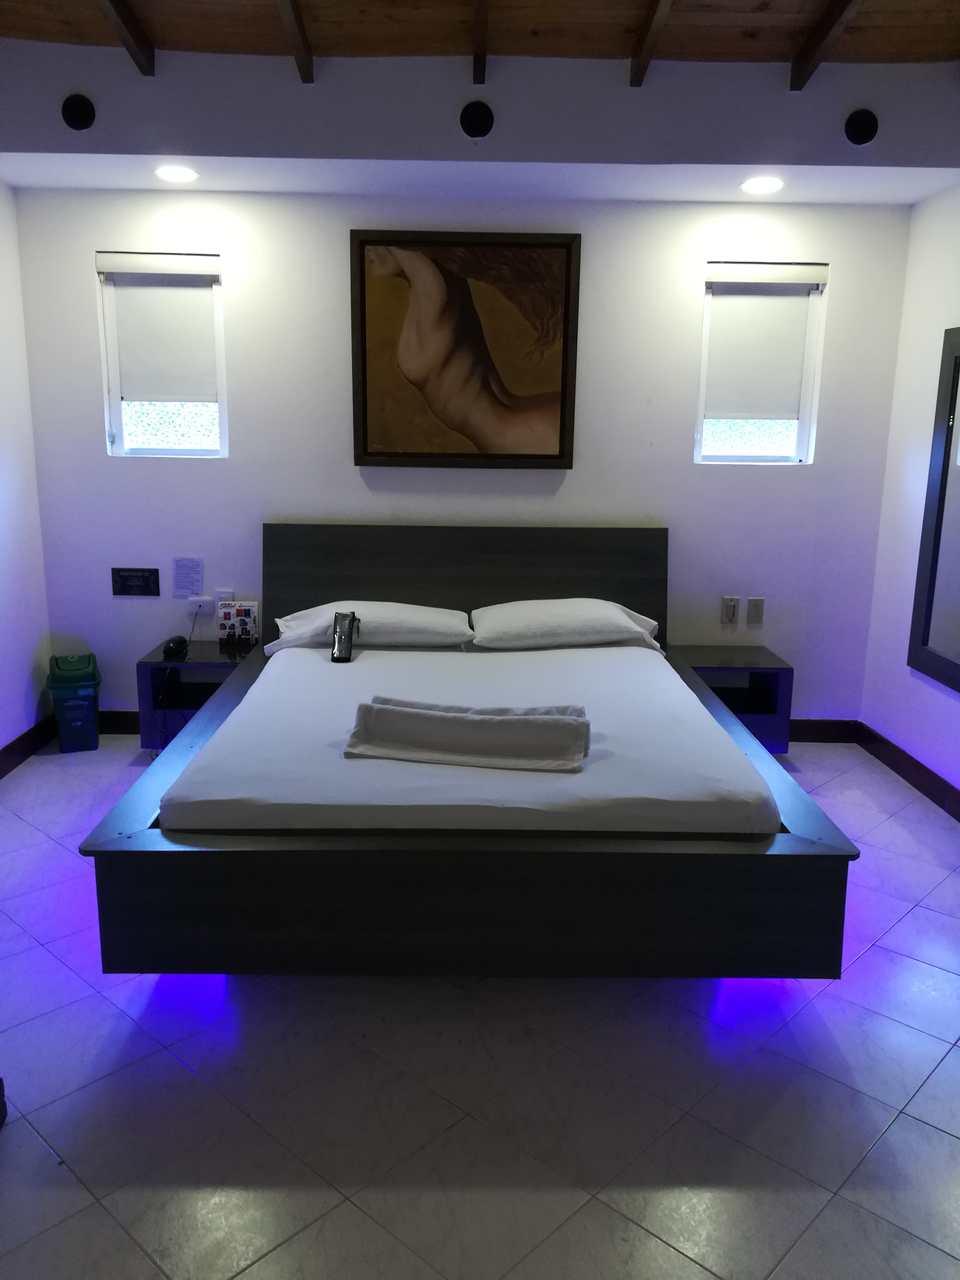 Mónaco Uno en La Estrella : MotelNow